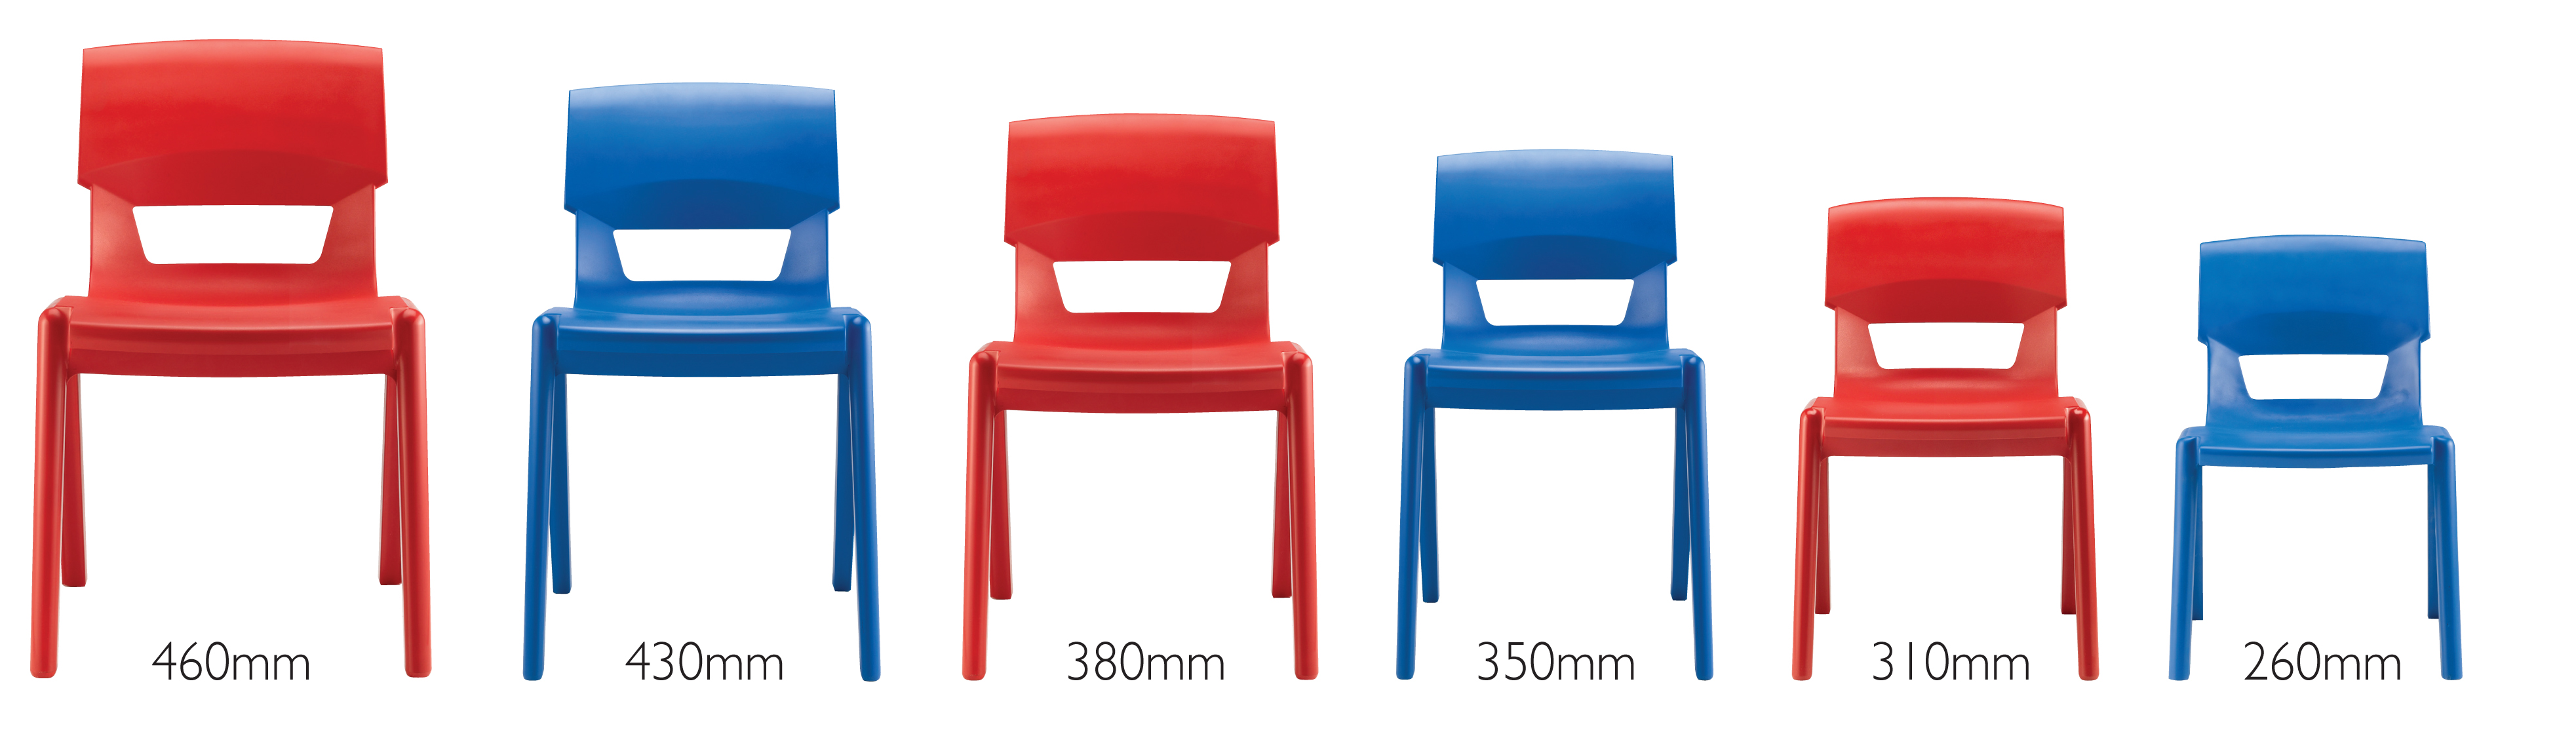 Postura-Plus-Size-Options